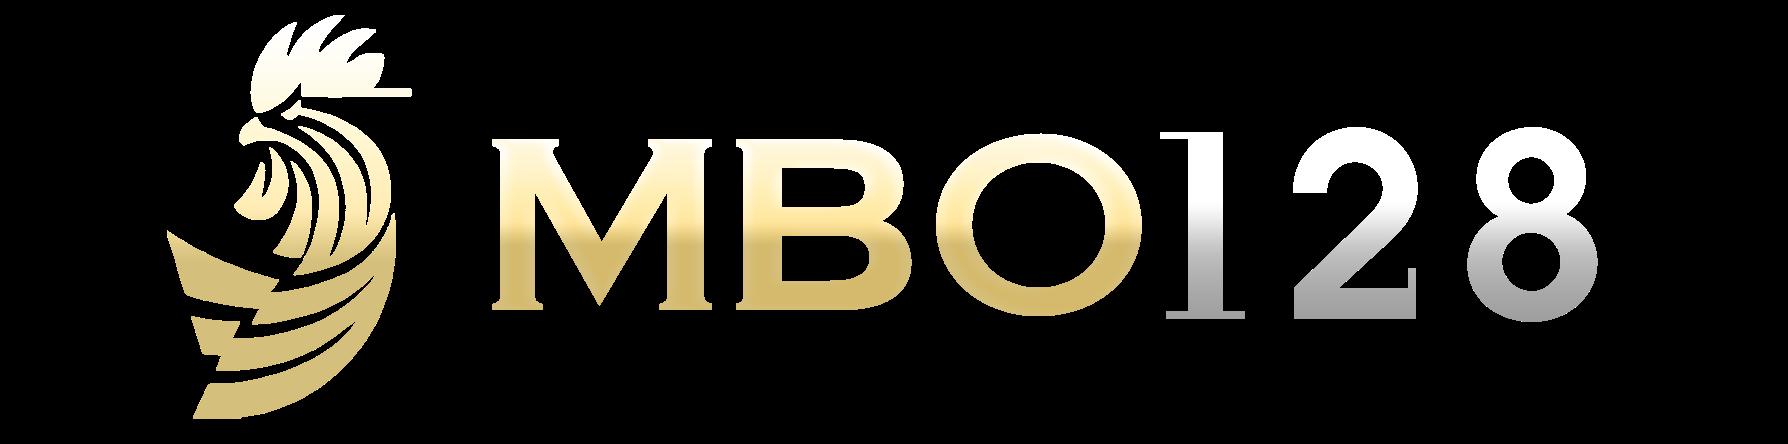 mbo128